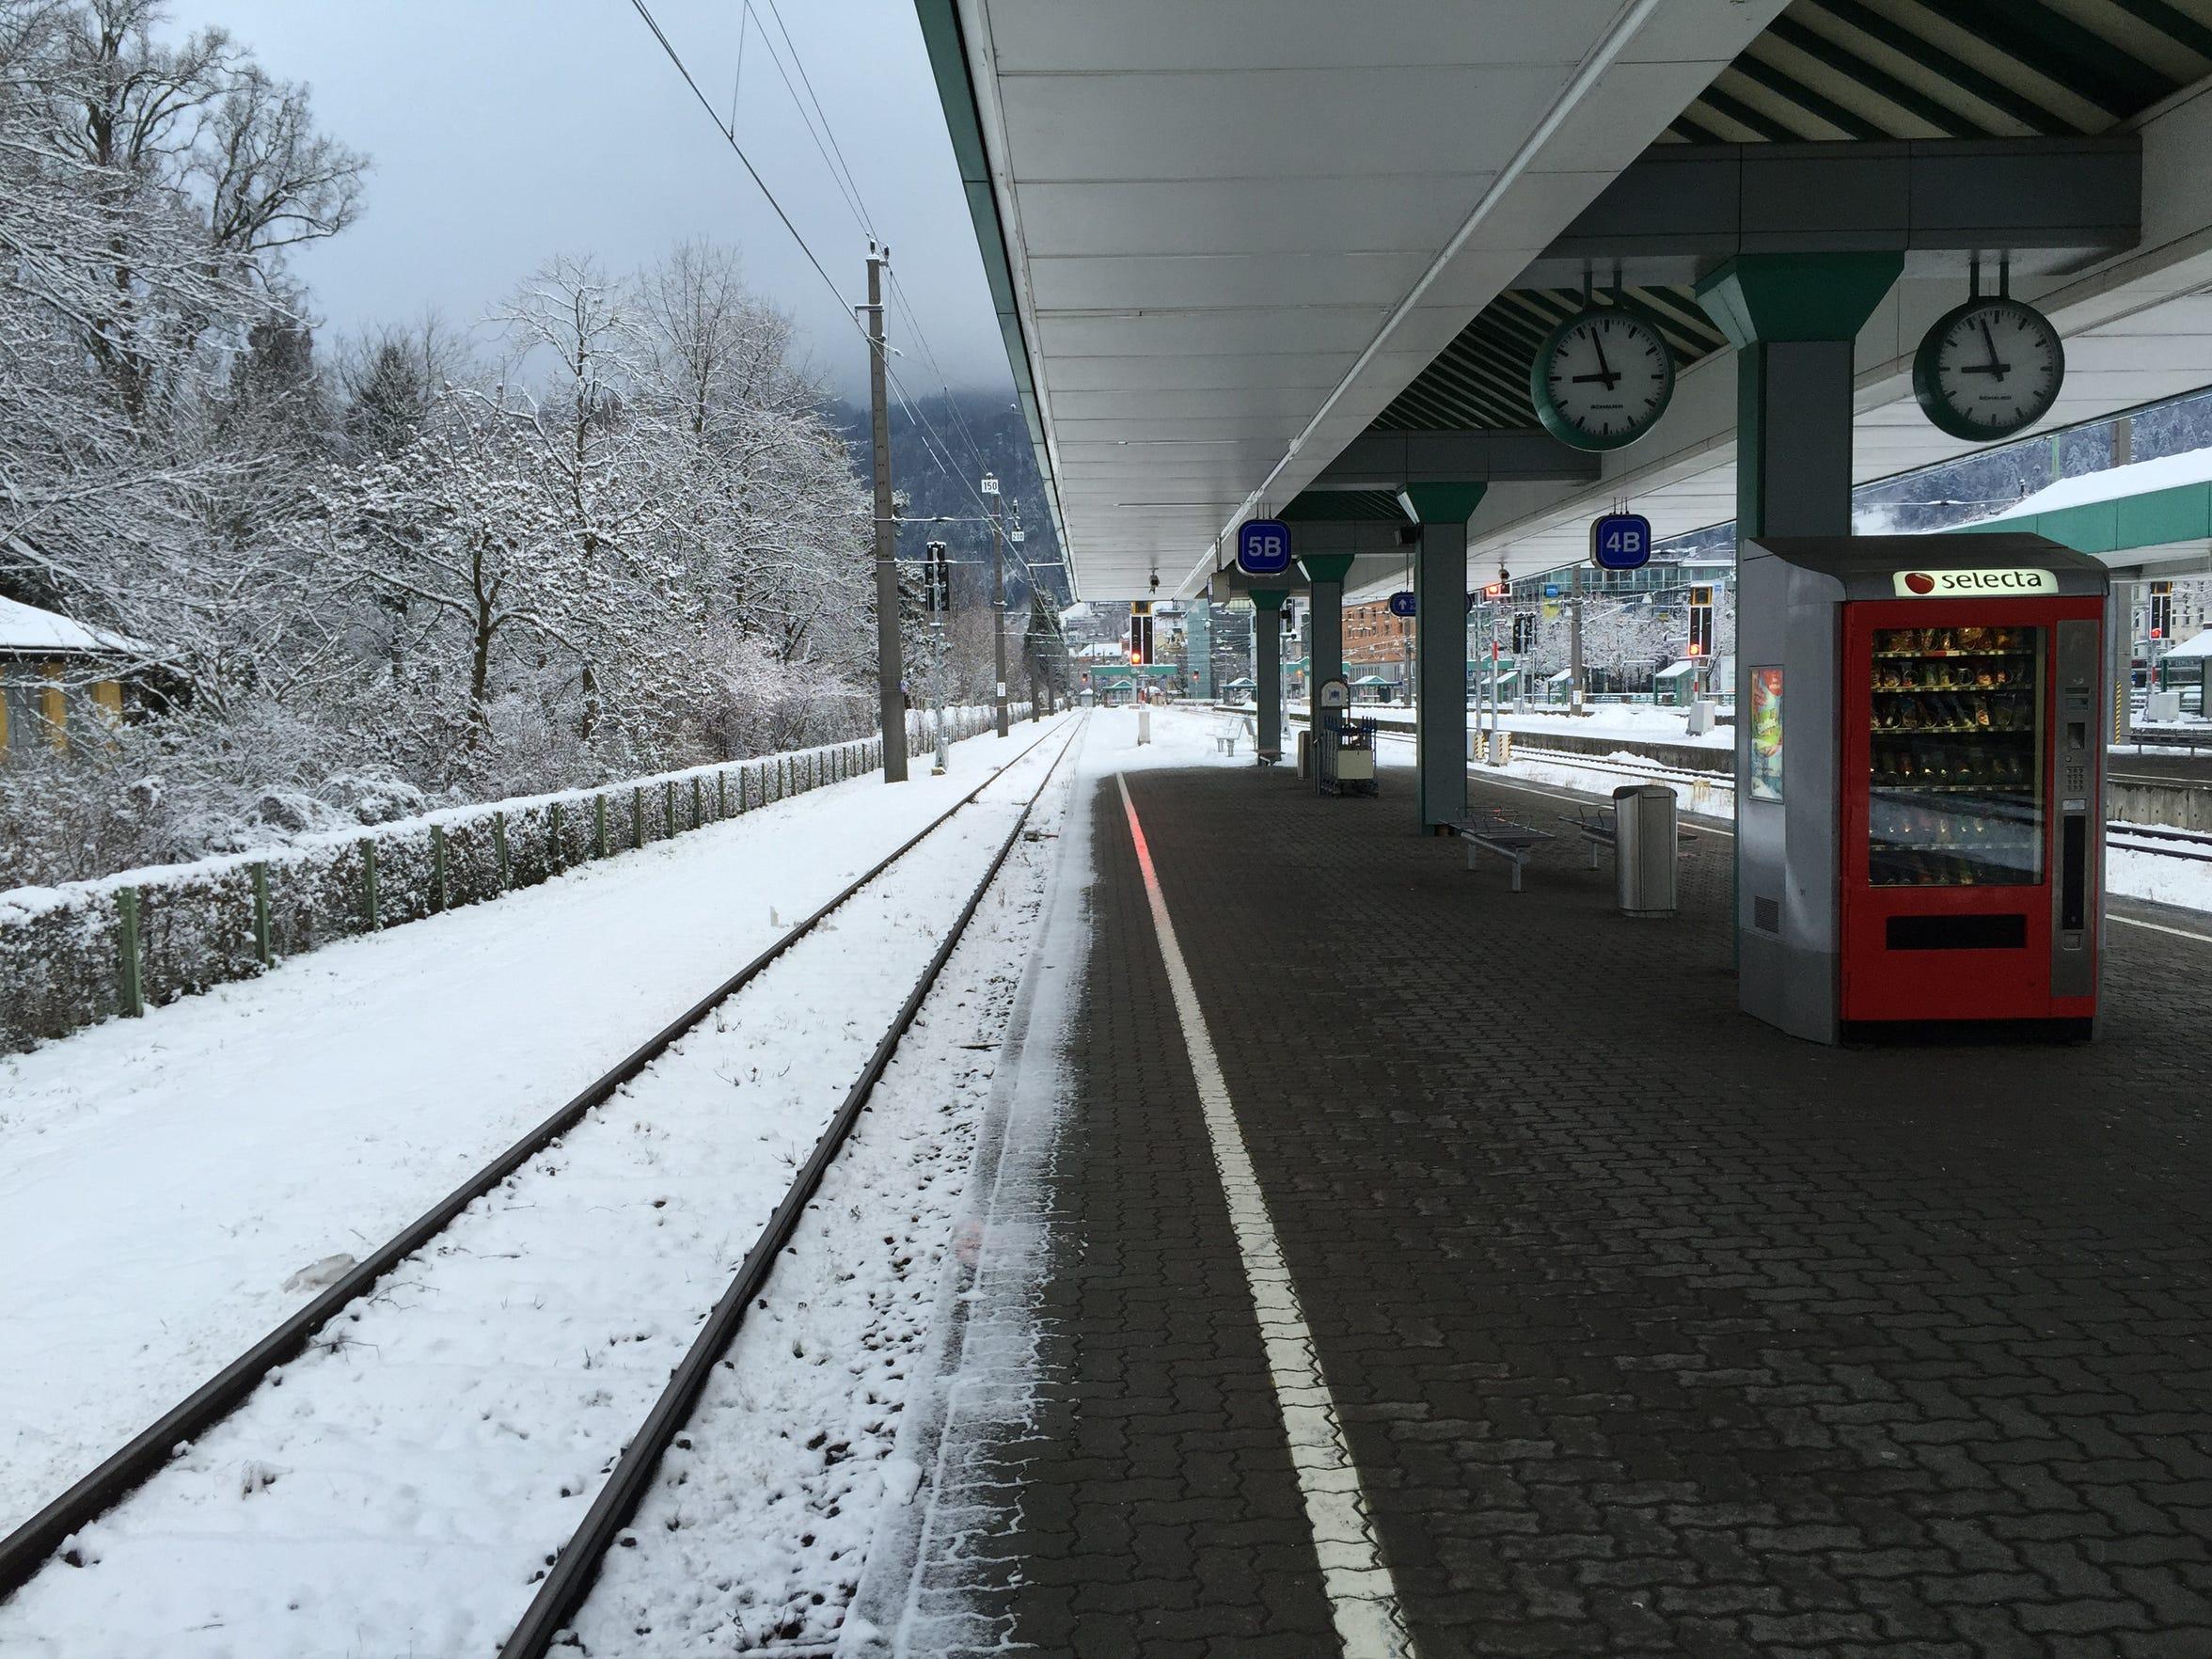 The train station at Dornbirn, Austria.